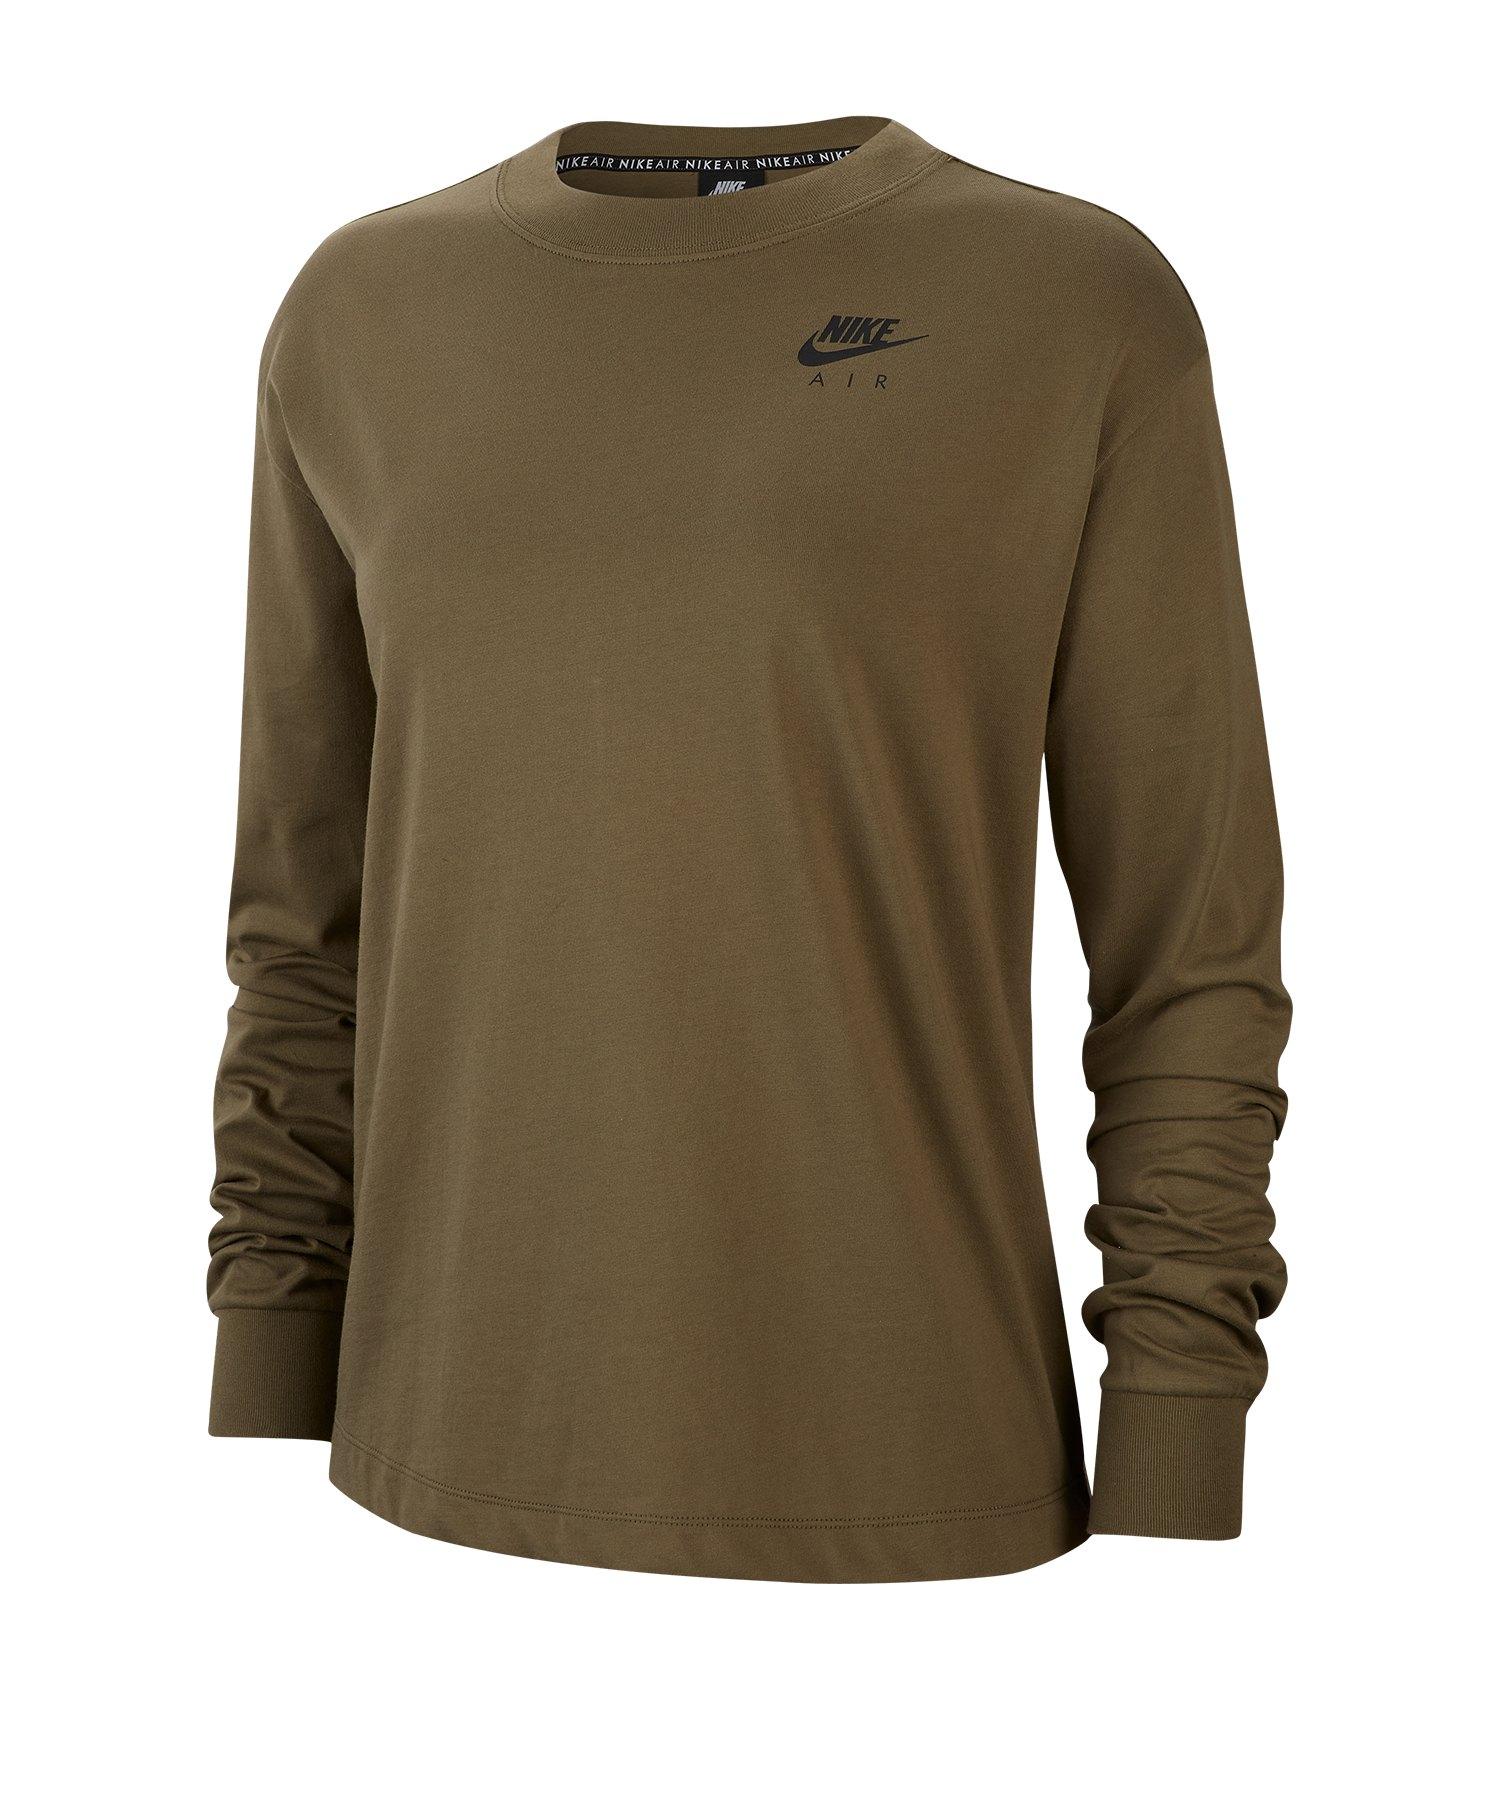 Nike Air Sweatshirt Damen Grün F222 - gruen